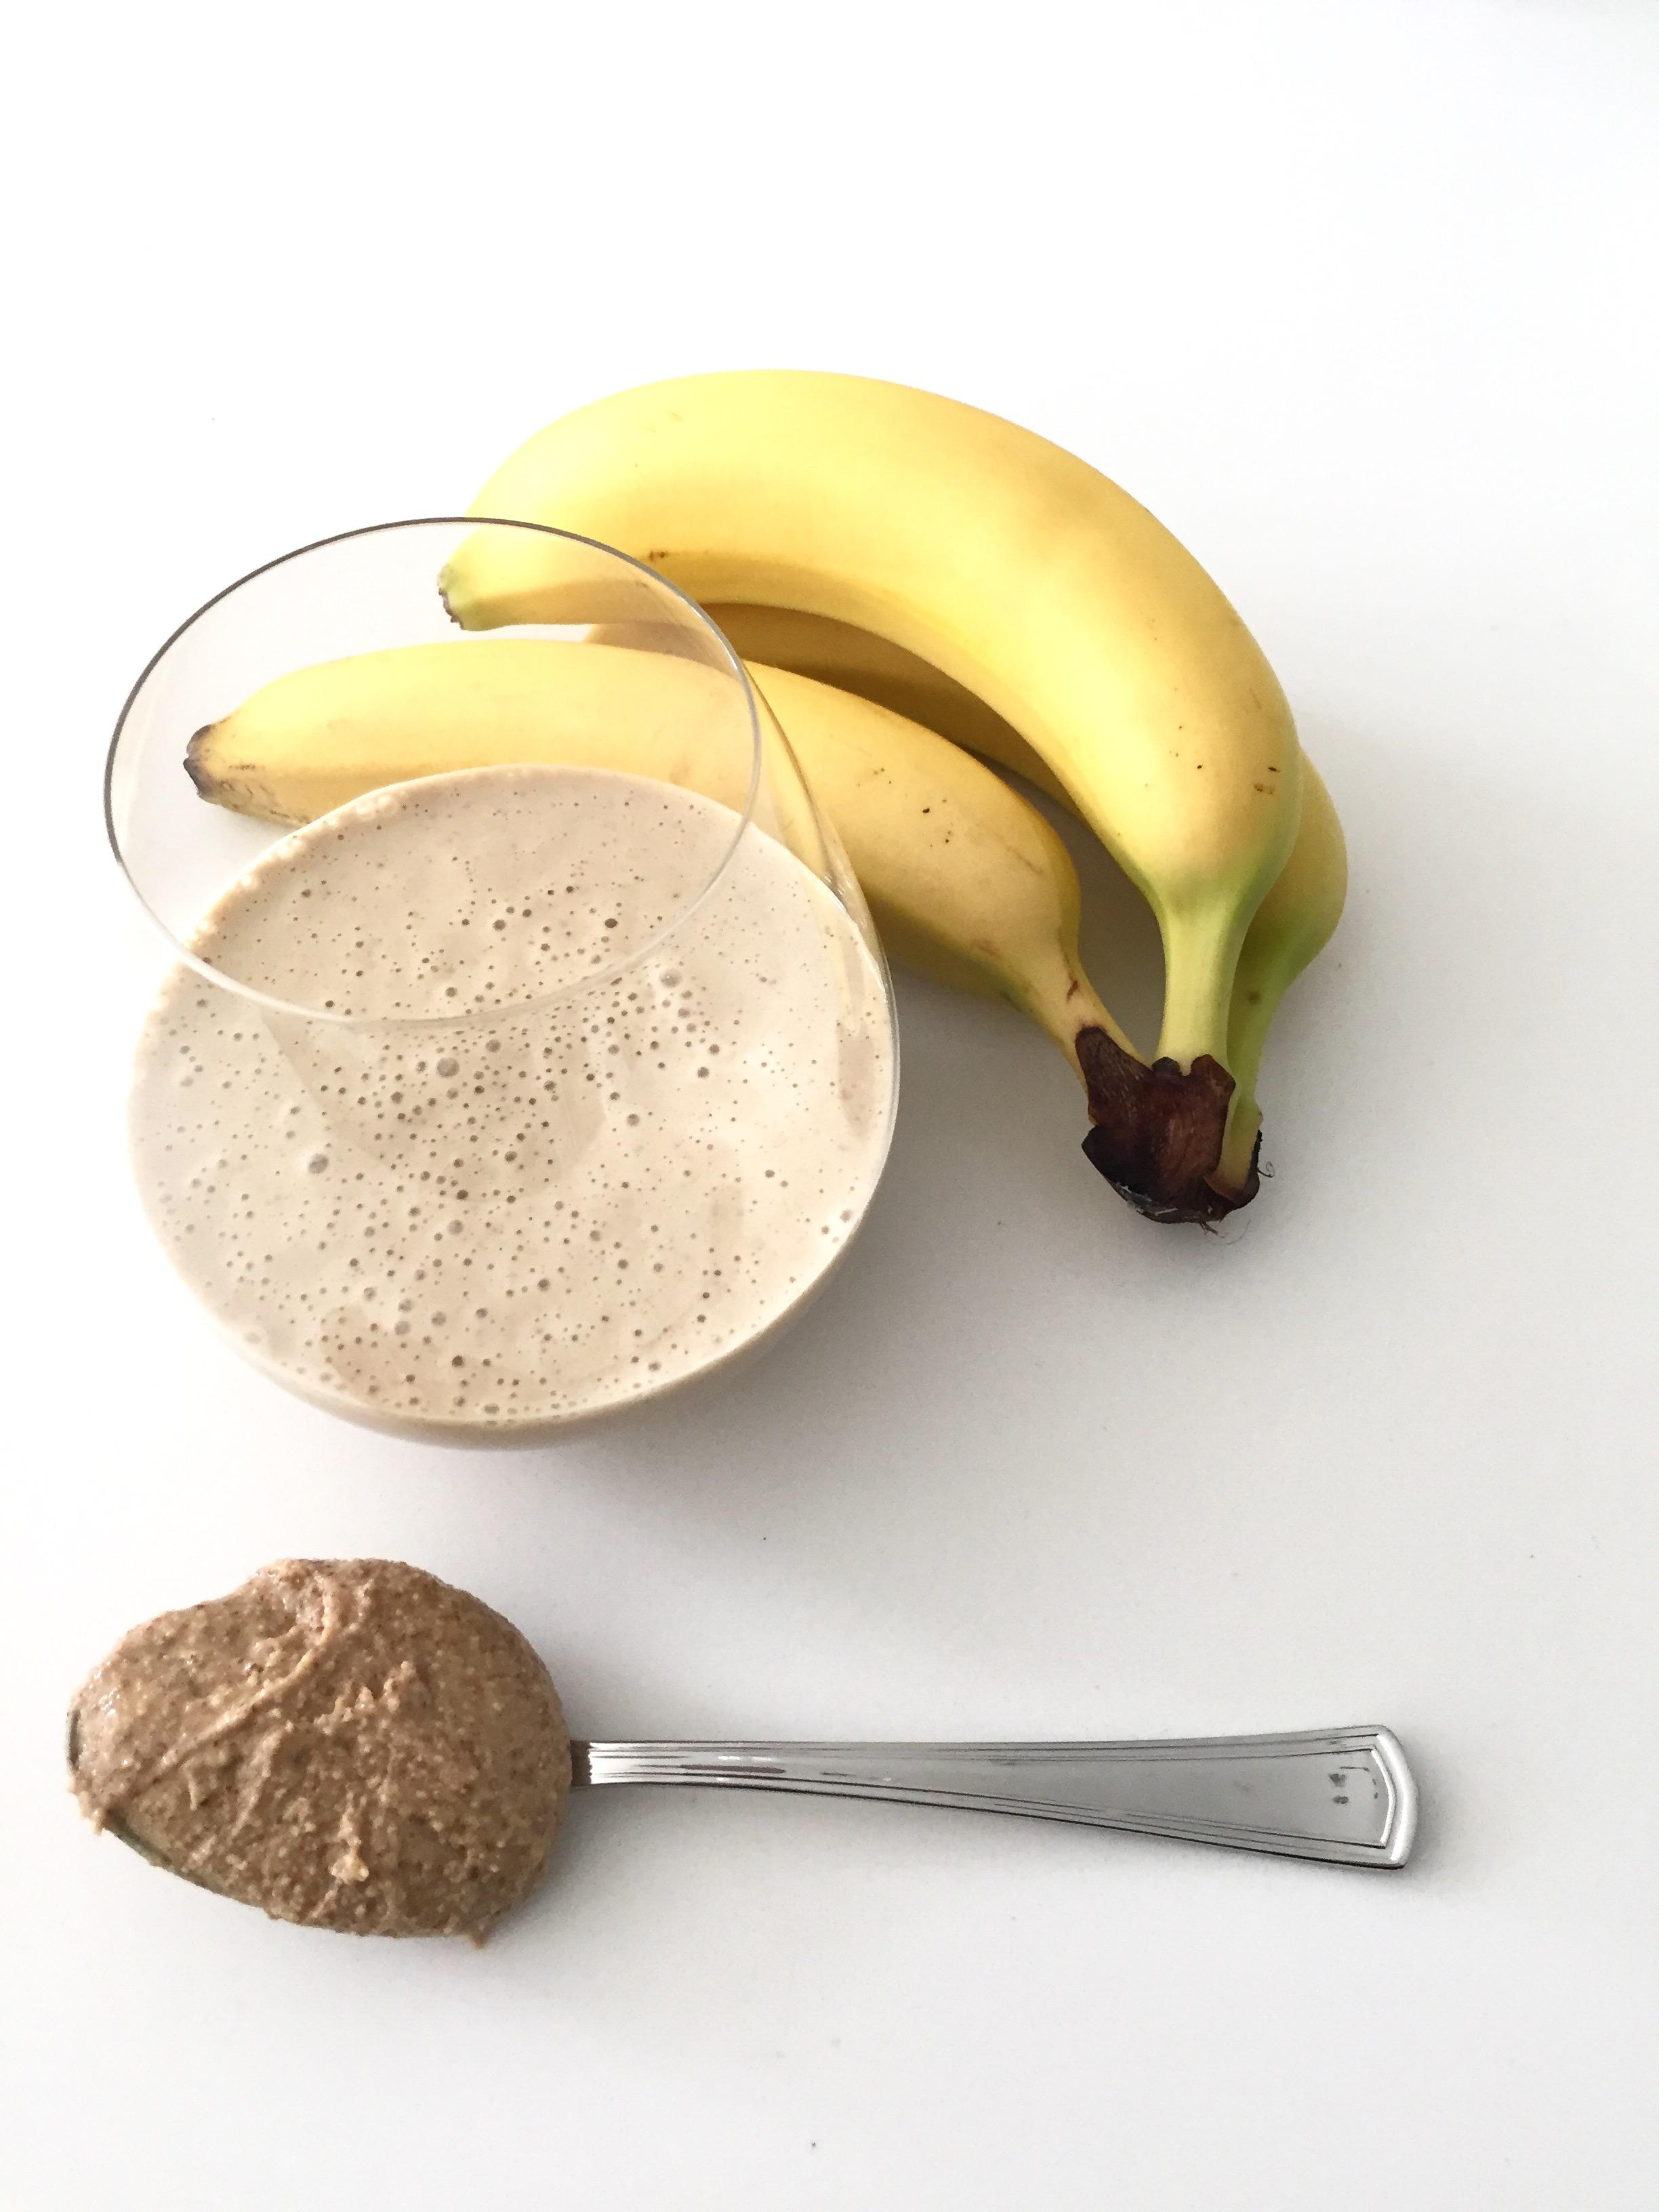 My Favorite Protein Shake